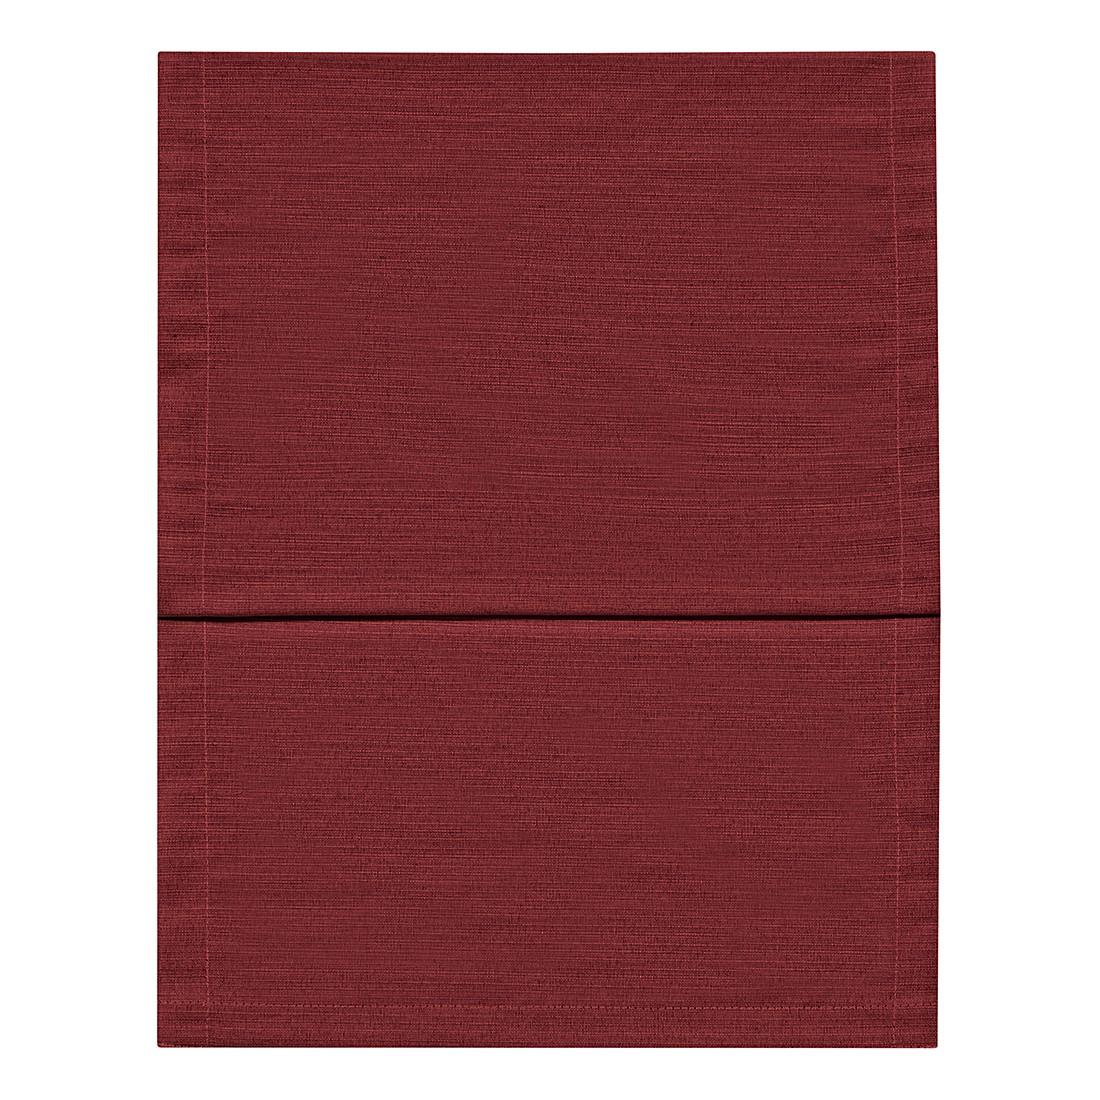 Tischläufer Franca – Rot, Magma-Heimtex kaufen